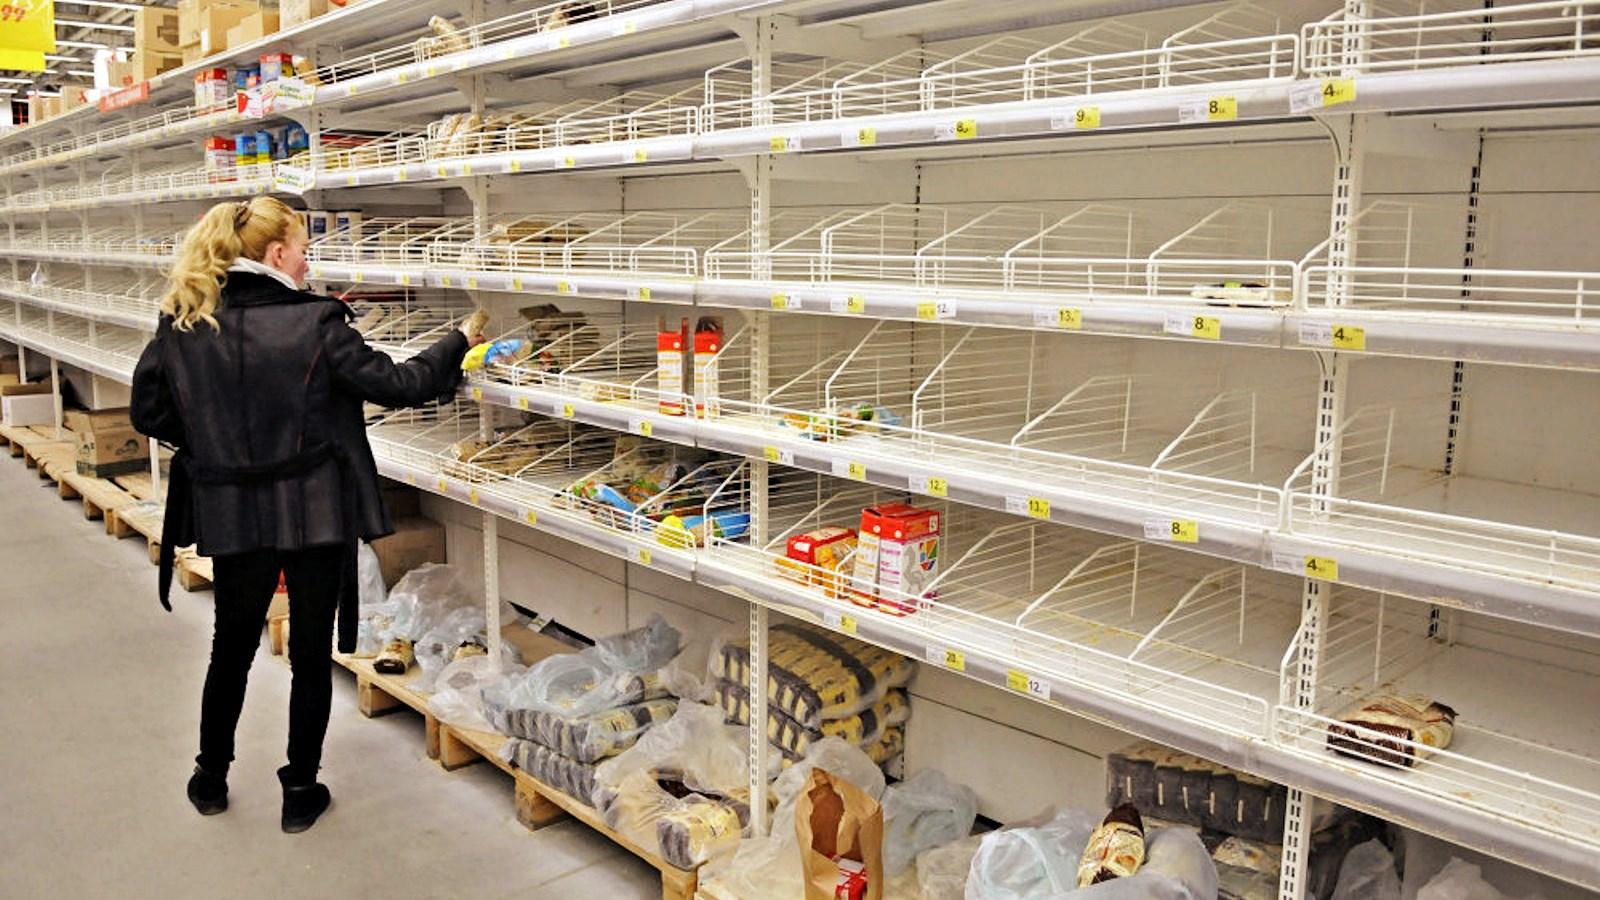 00 ukrainian shop. 03.03.15